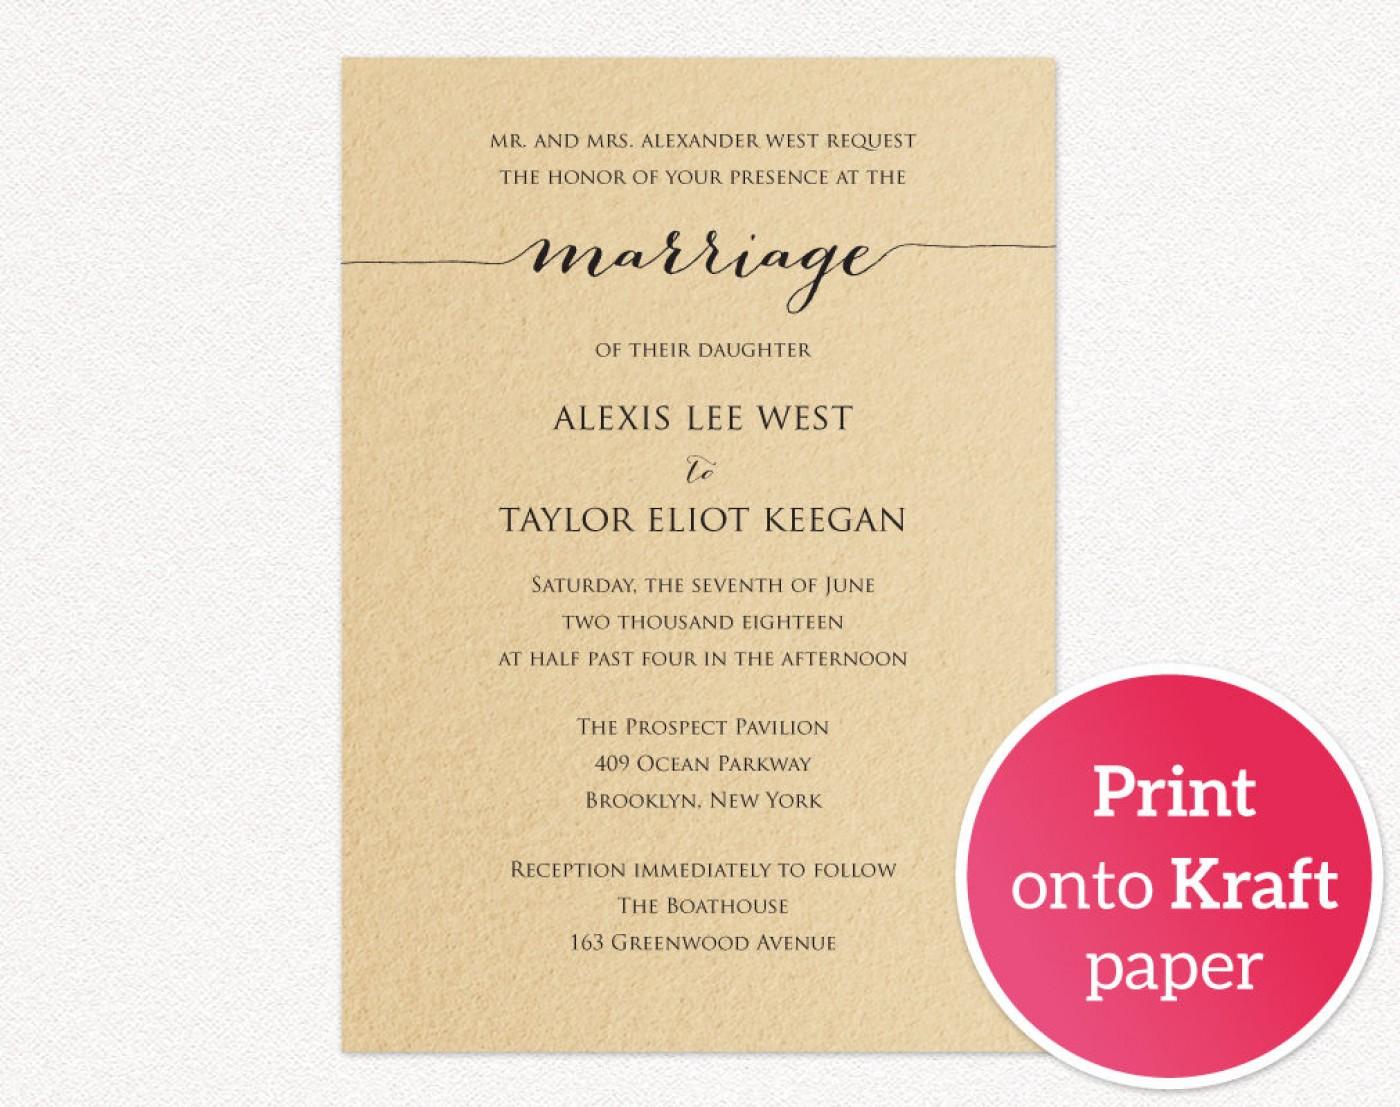 008 Astounding Printable Wedding Invitation Template Example  Free For Microsoft Word Vintage1400